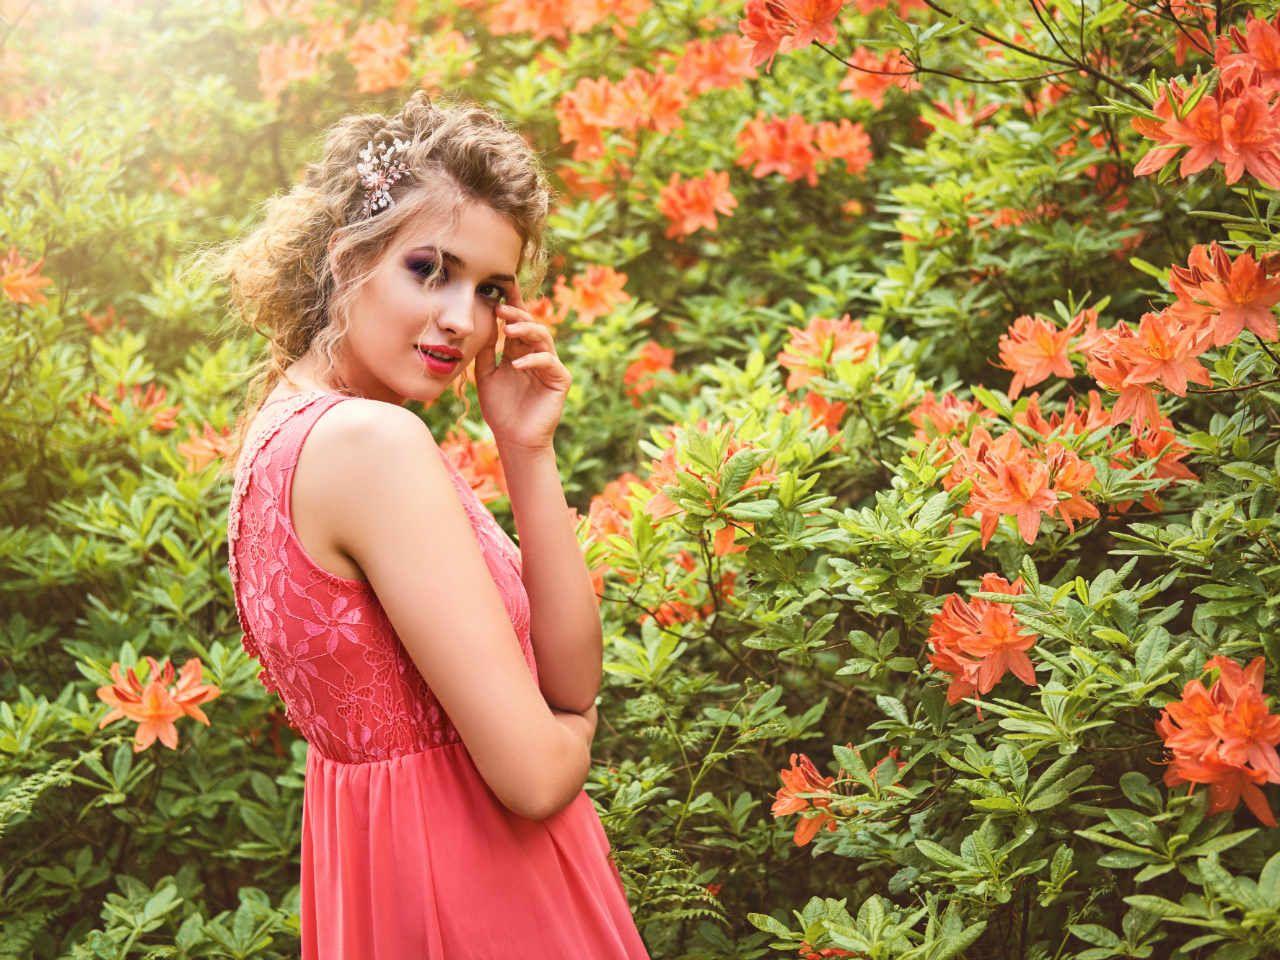 Modne Fryzury Na Lato 2019 Proste I Szybkie Pomysły Na